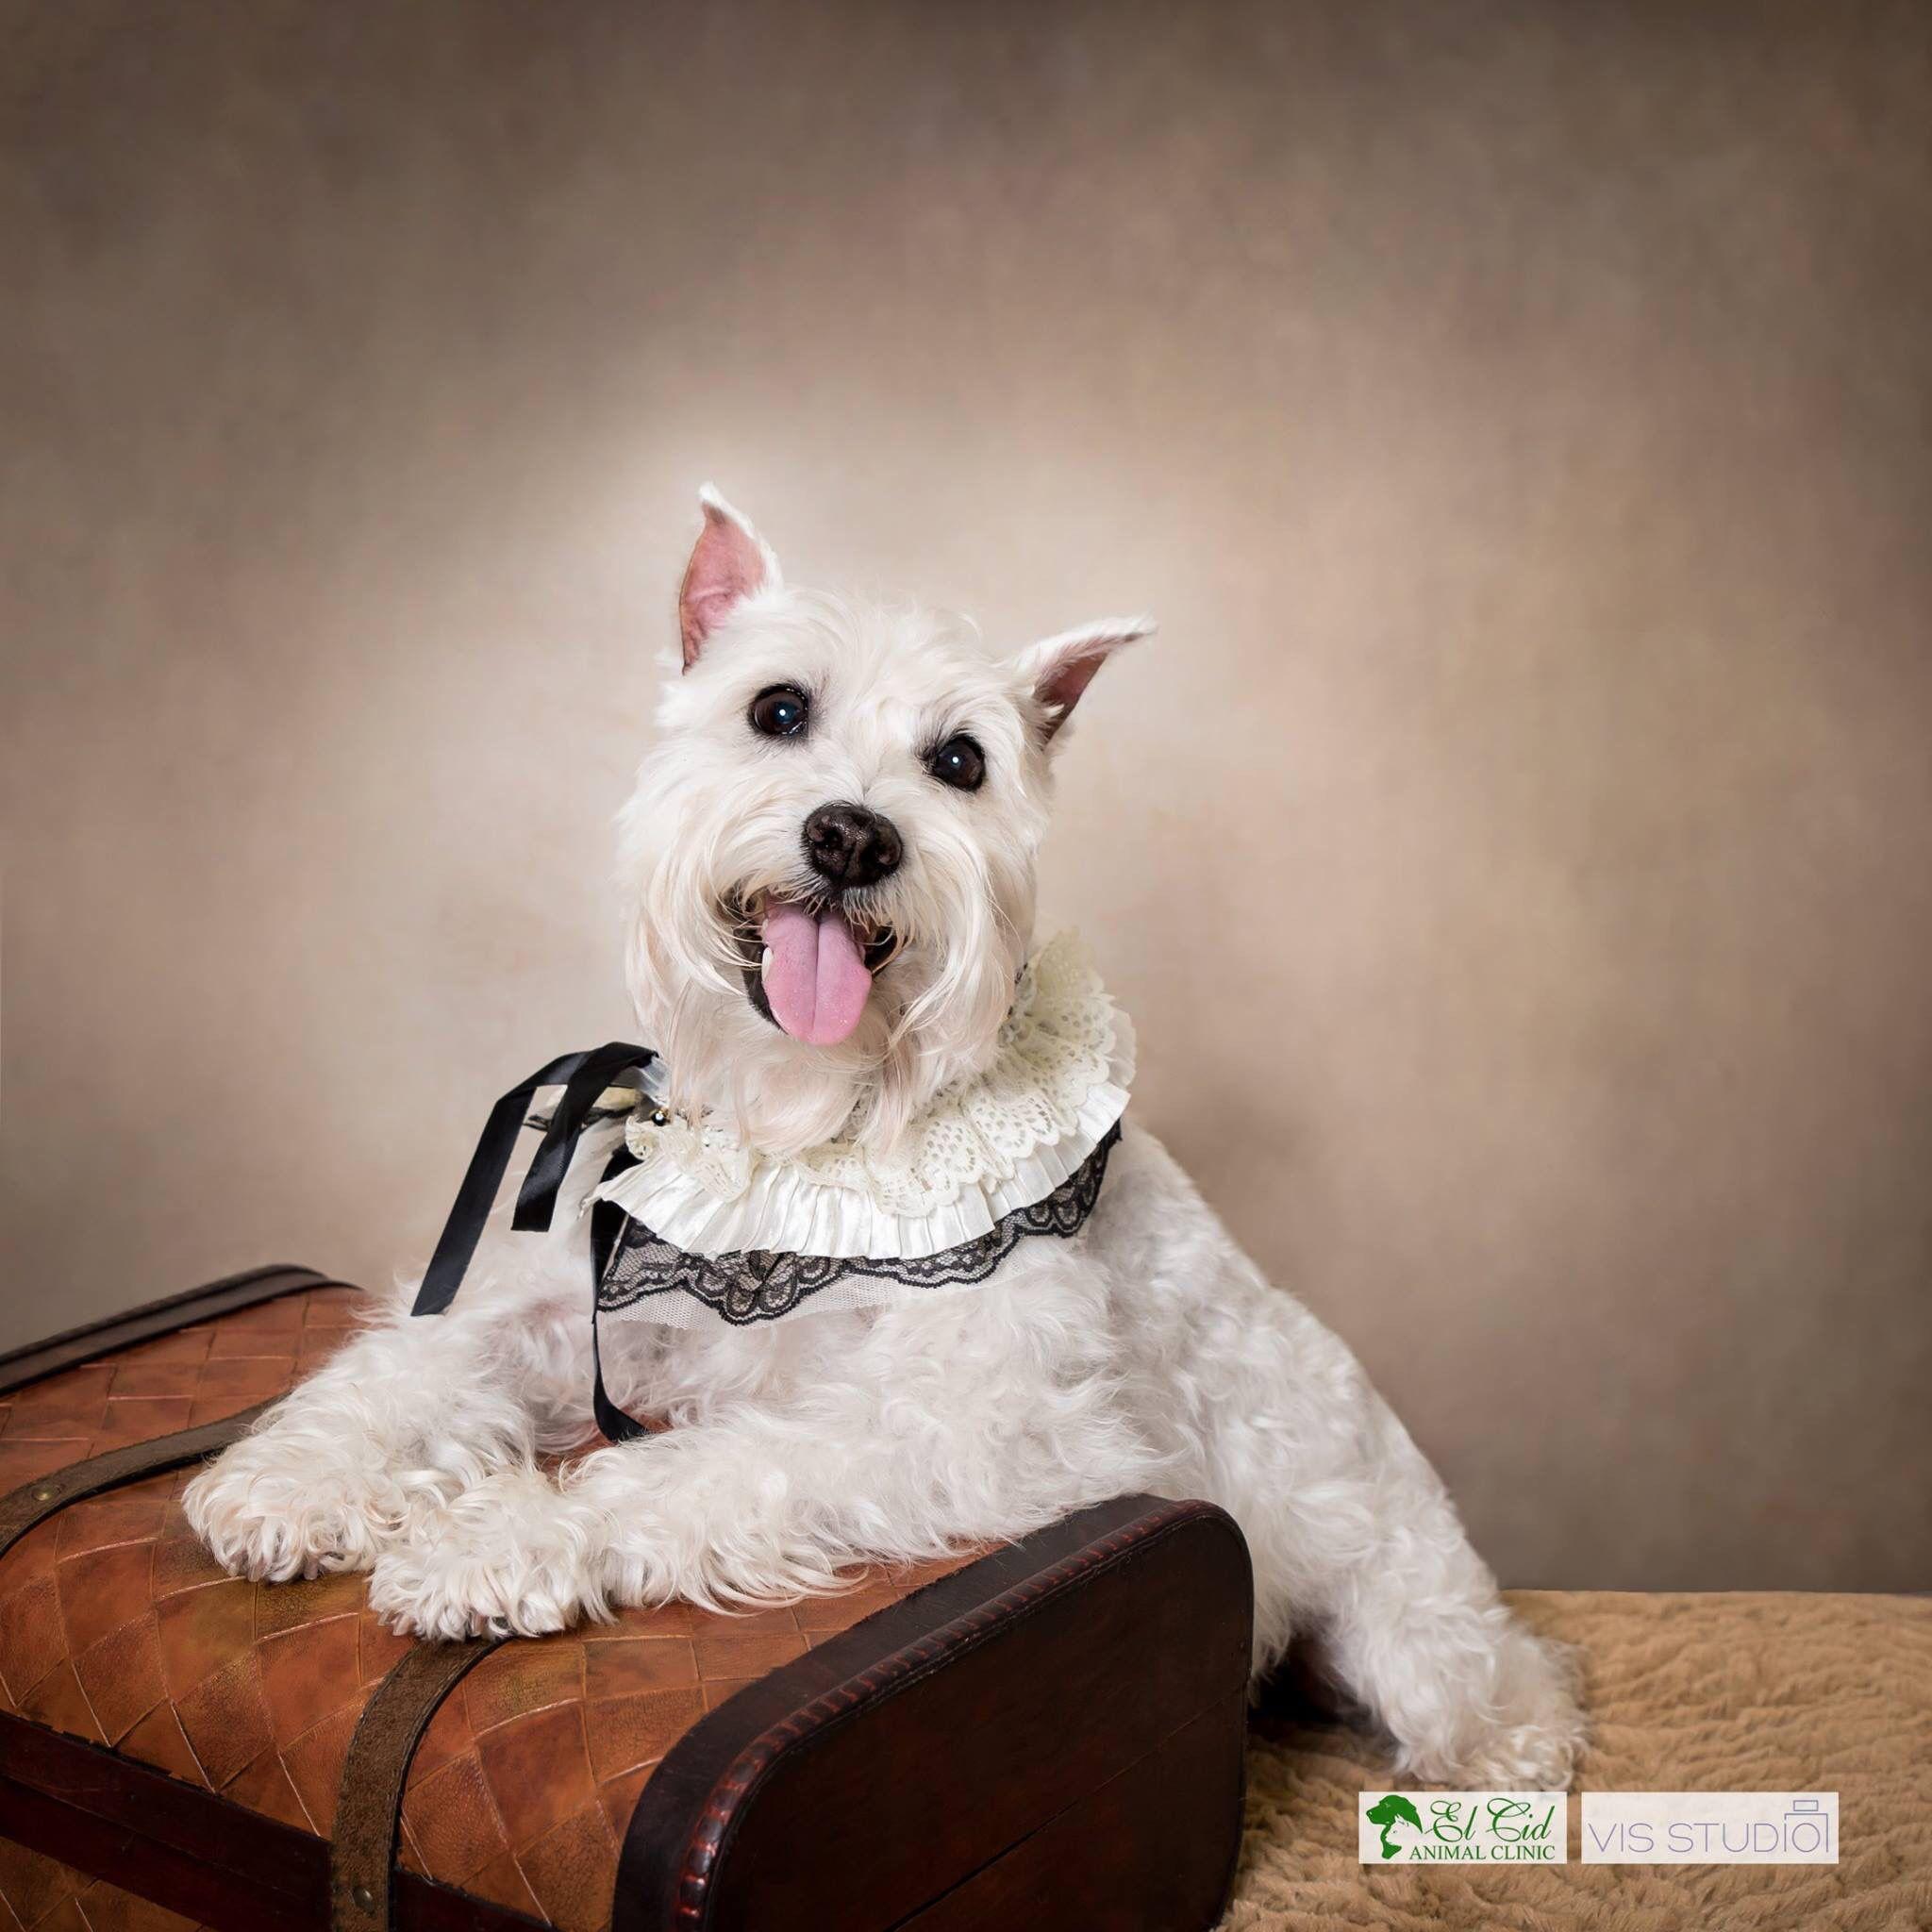 El Cid Animal Clinic Pet Photographer Pet Photography Dog Photographer Dog Photos Dog Photography Palm Beach Animal Photography Dog Photos Dog Photograph